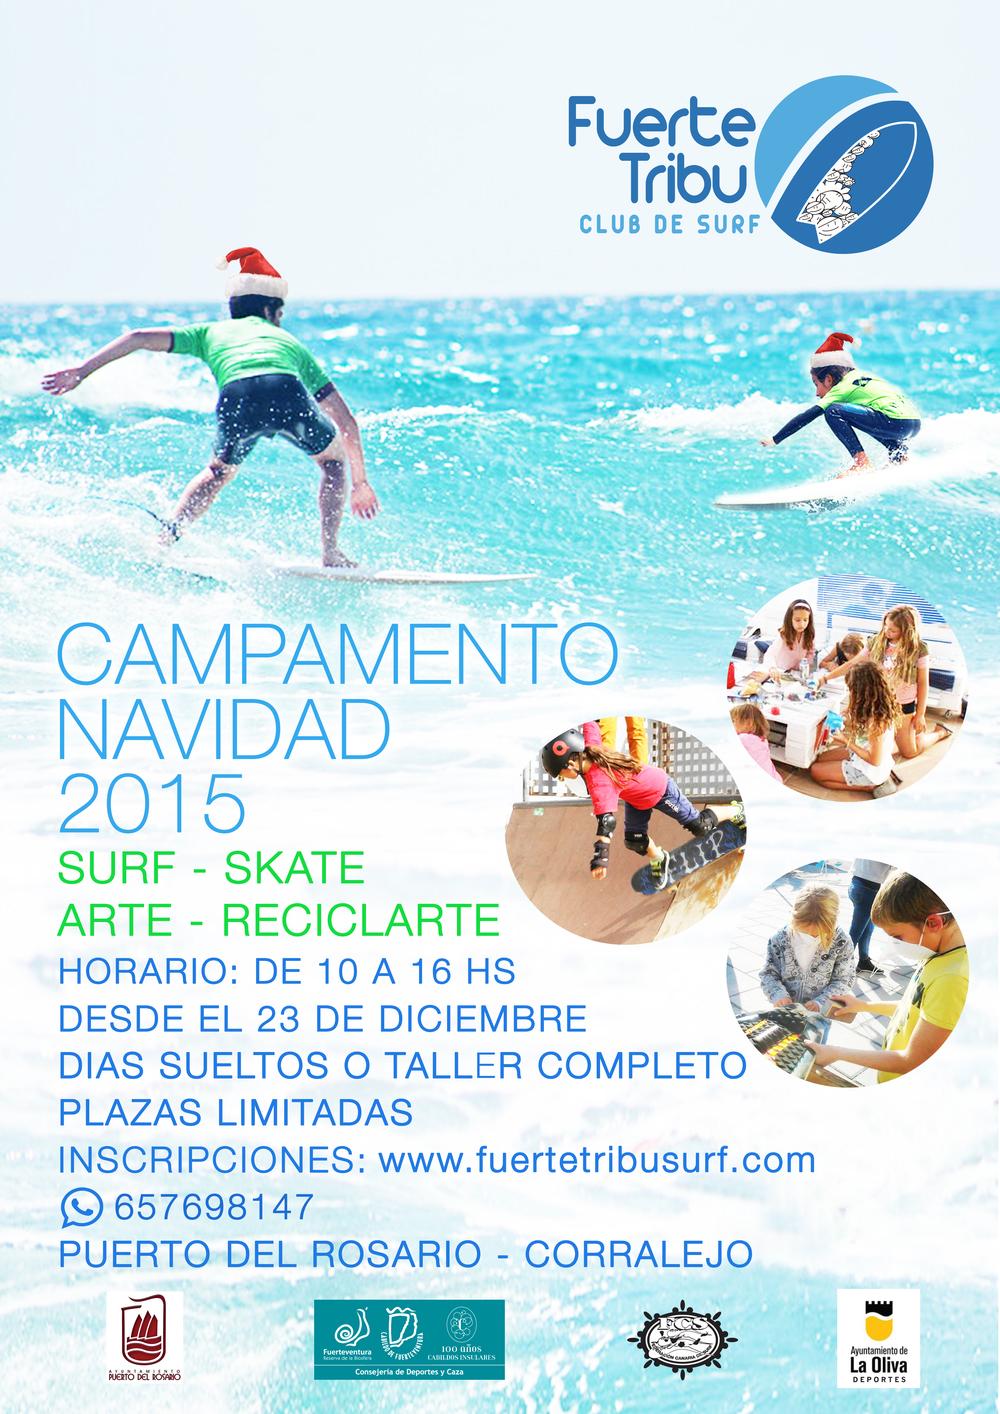 CURSOS DE SURF FUERTEVENTURA, SURF FUERTEVENTURA NIÑOS